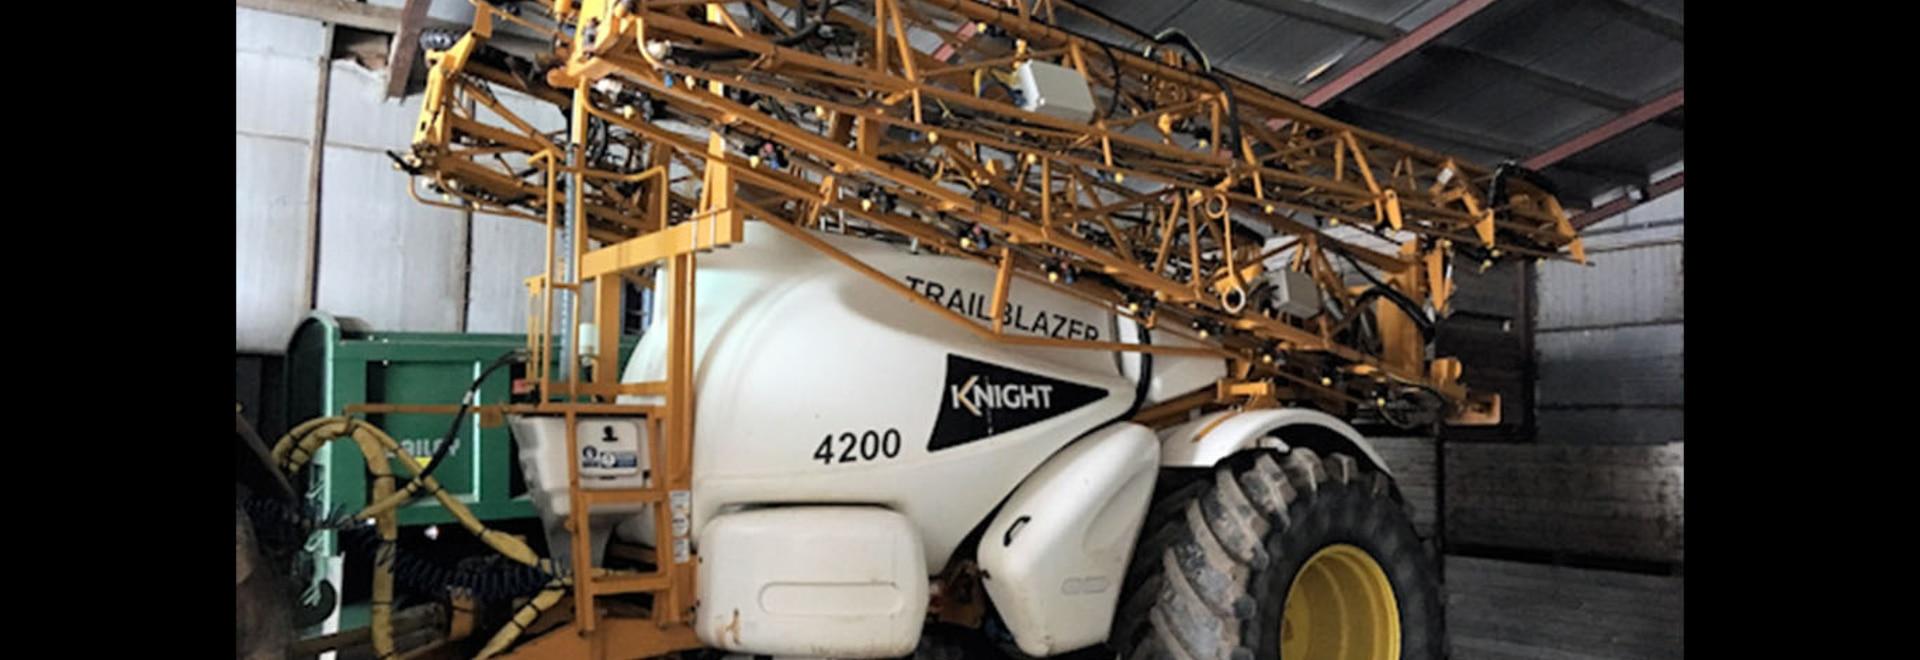 Knight blazes a new trail